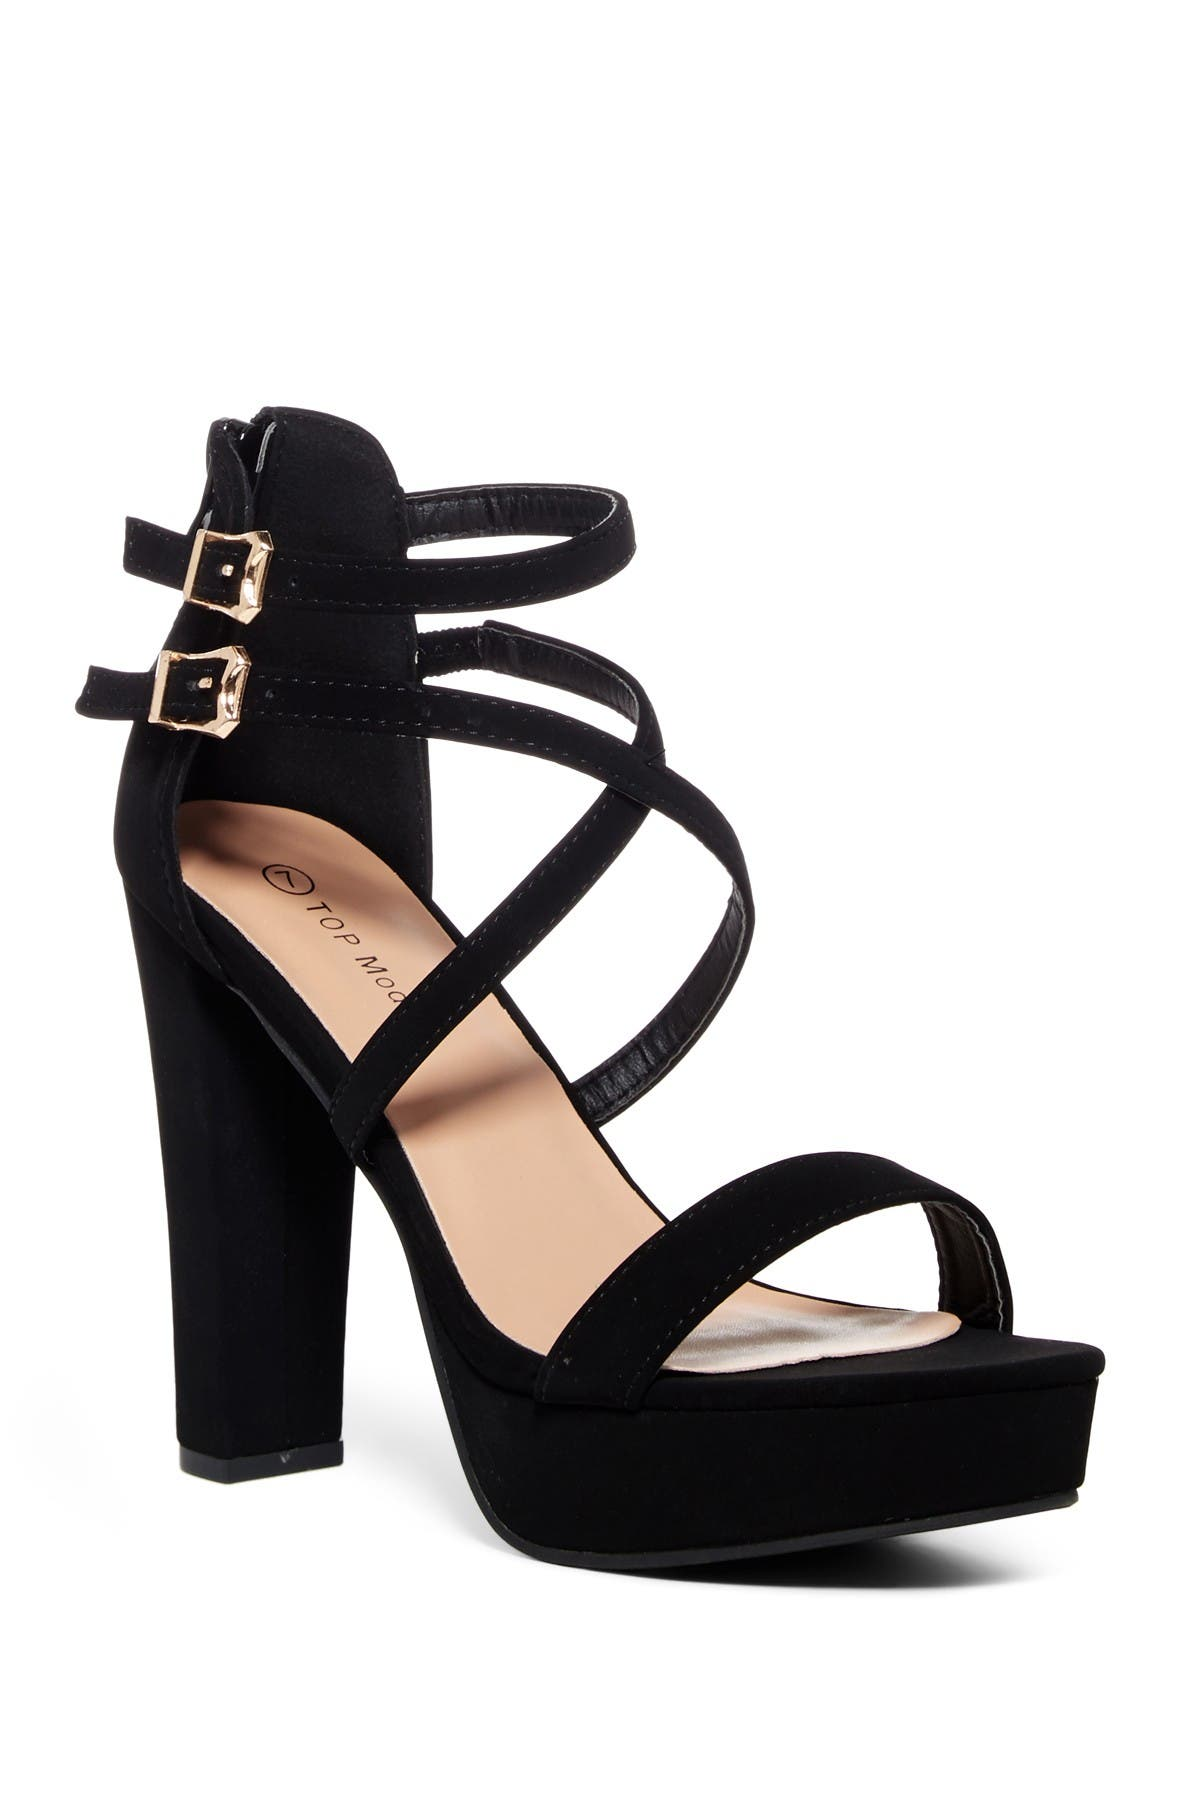 Image of Top Moda Lovely Platform Sandal